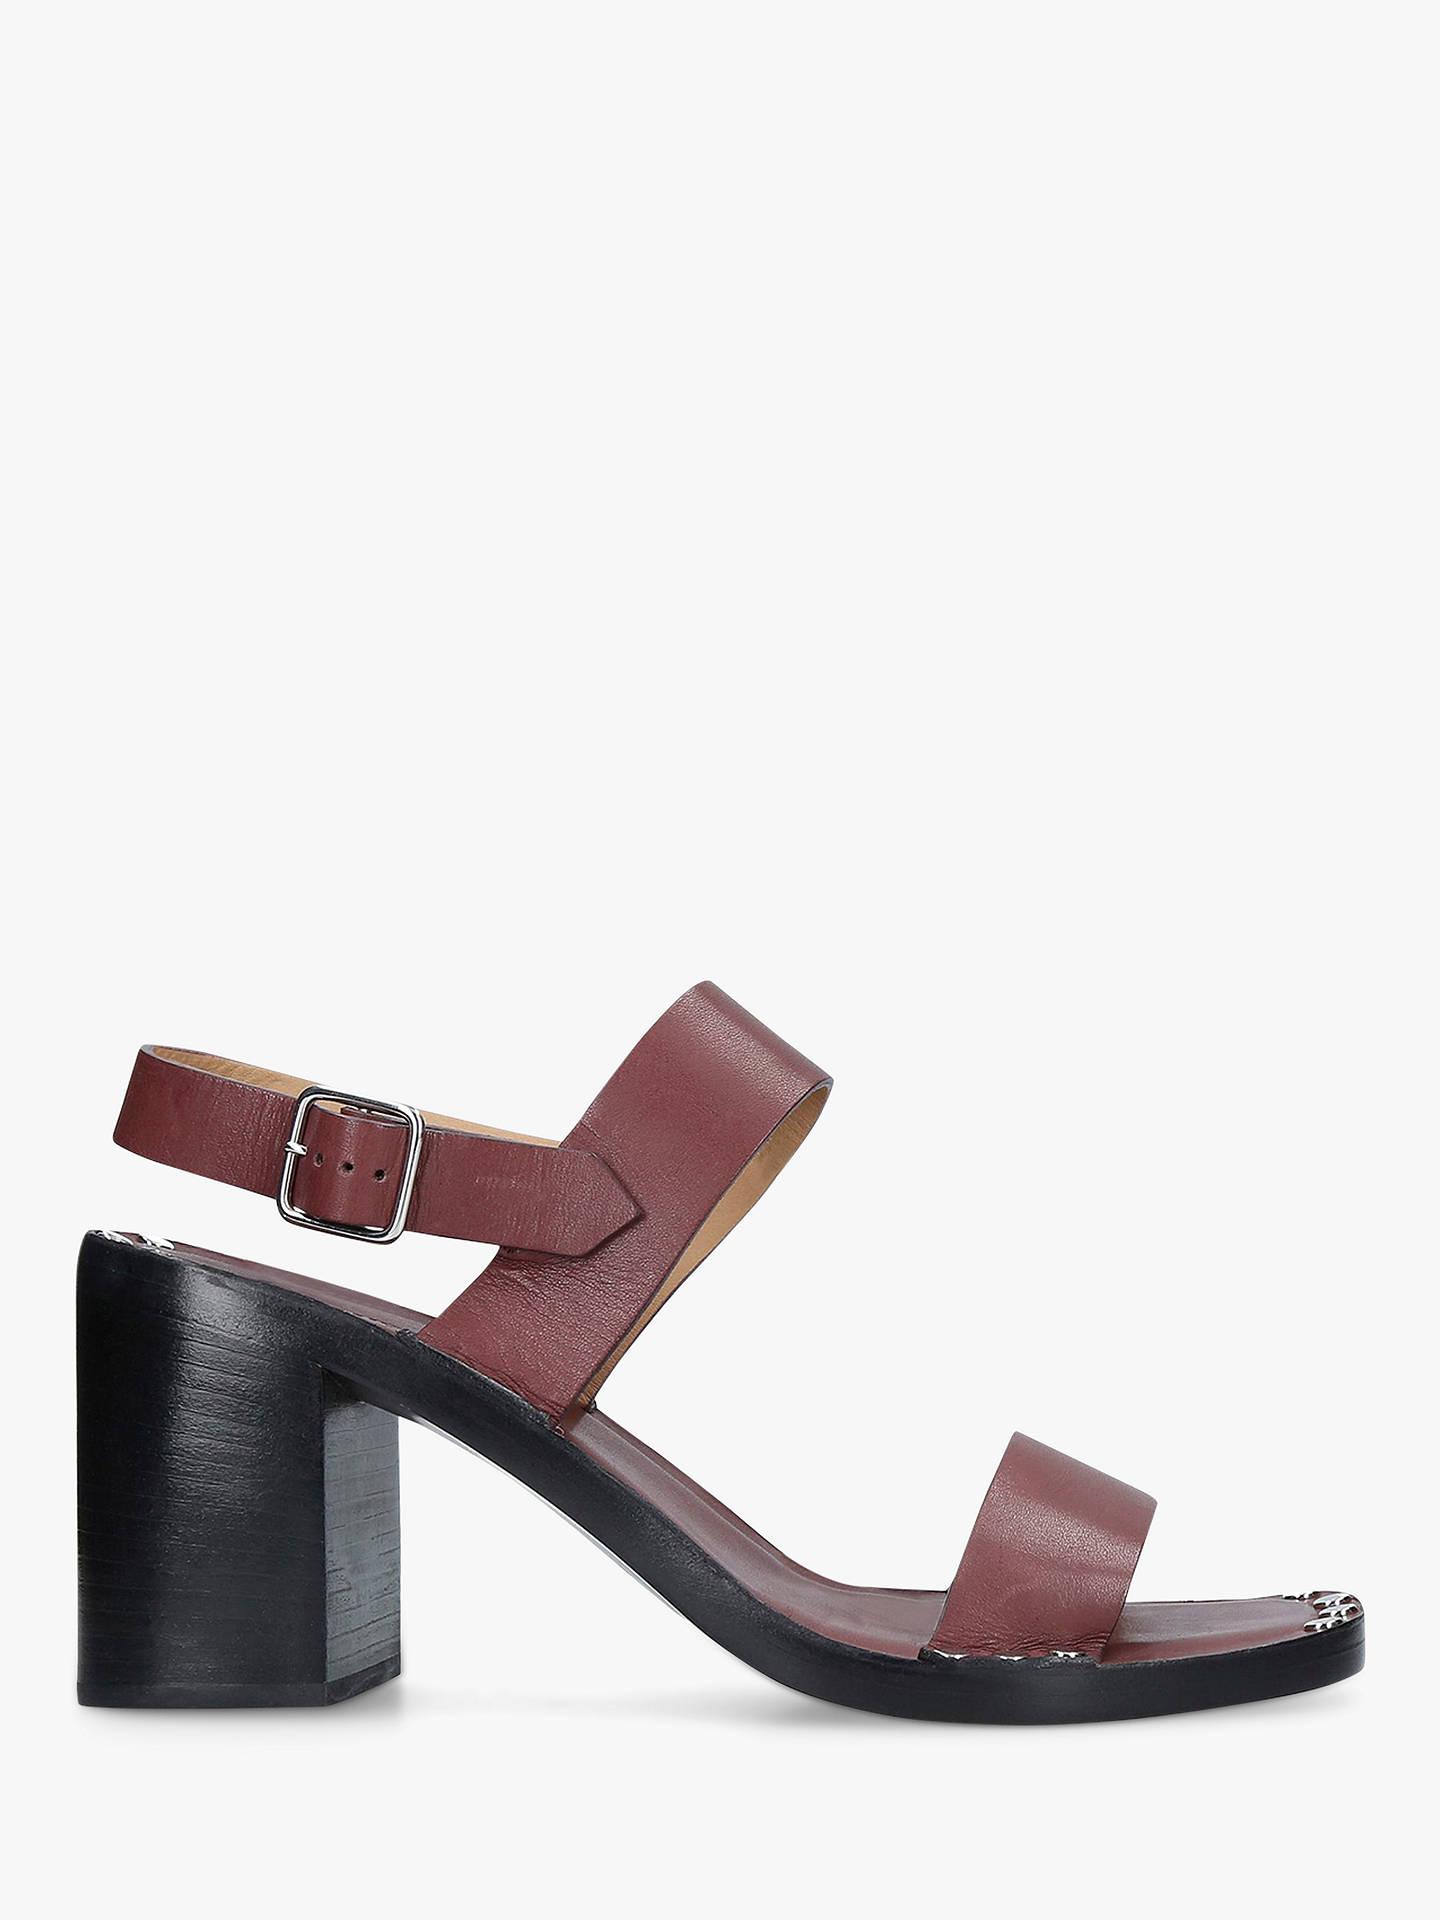 b42db07fc968 Buy Jil Sander Studded Block Heel Sandals